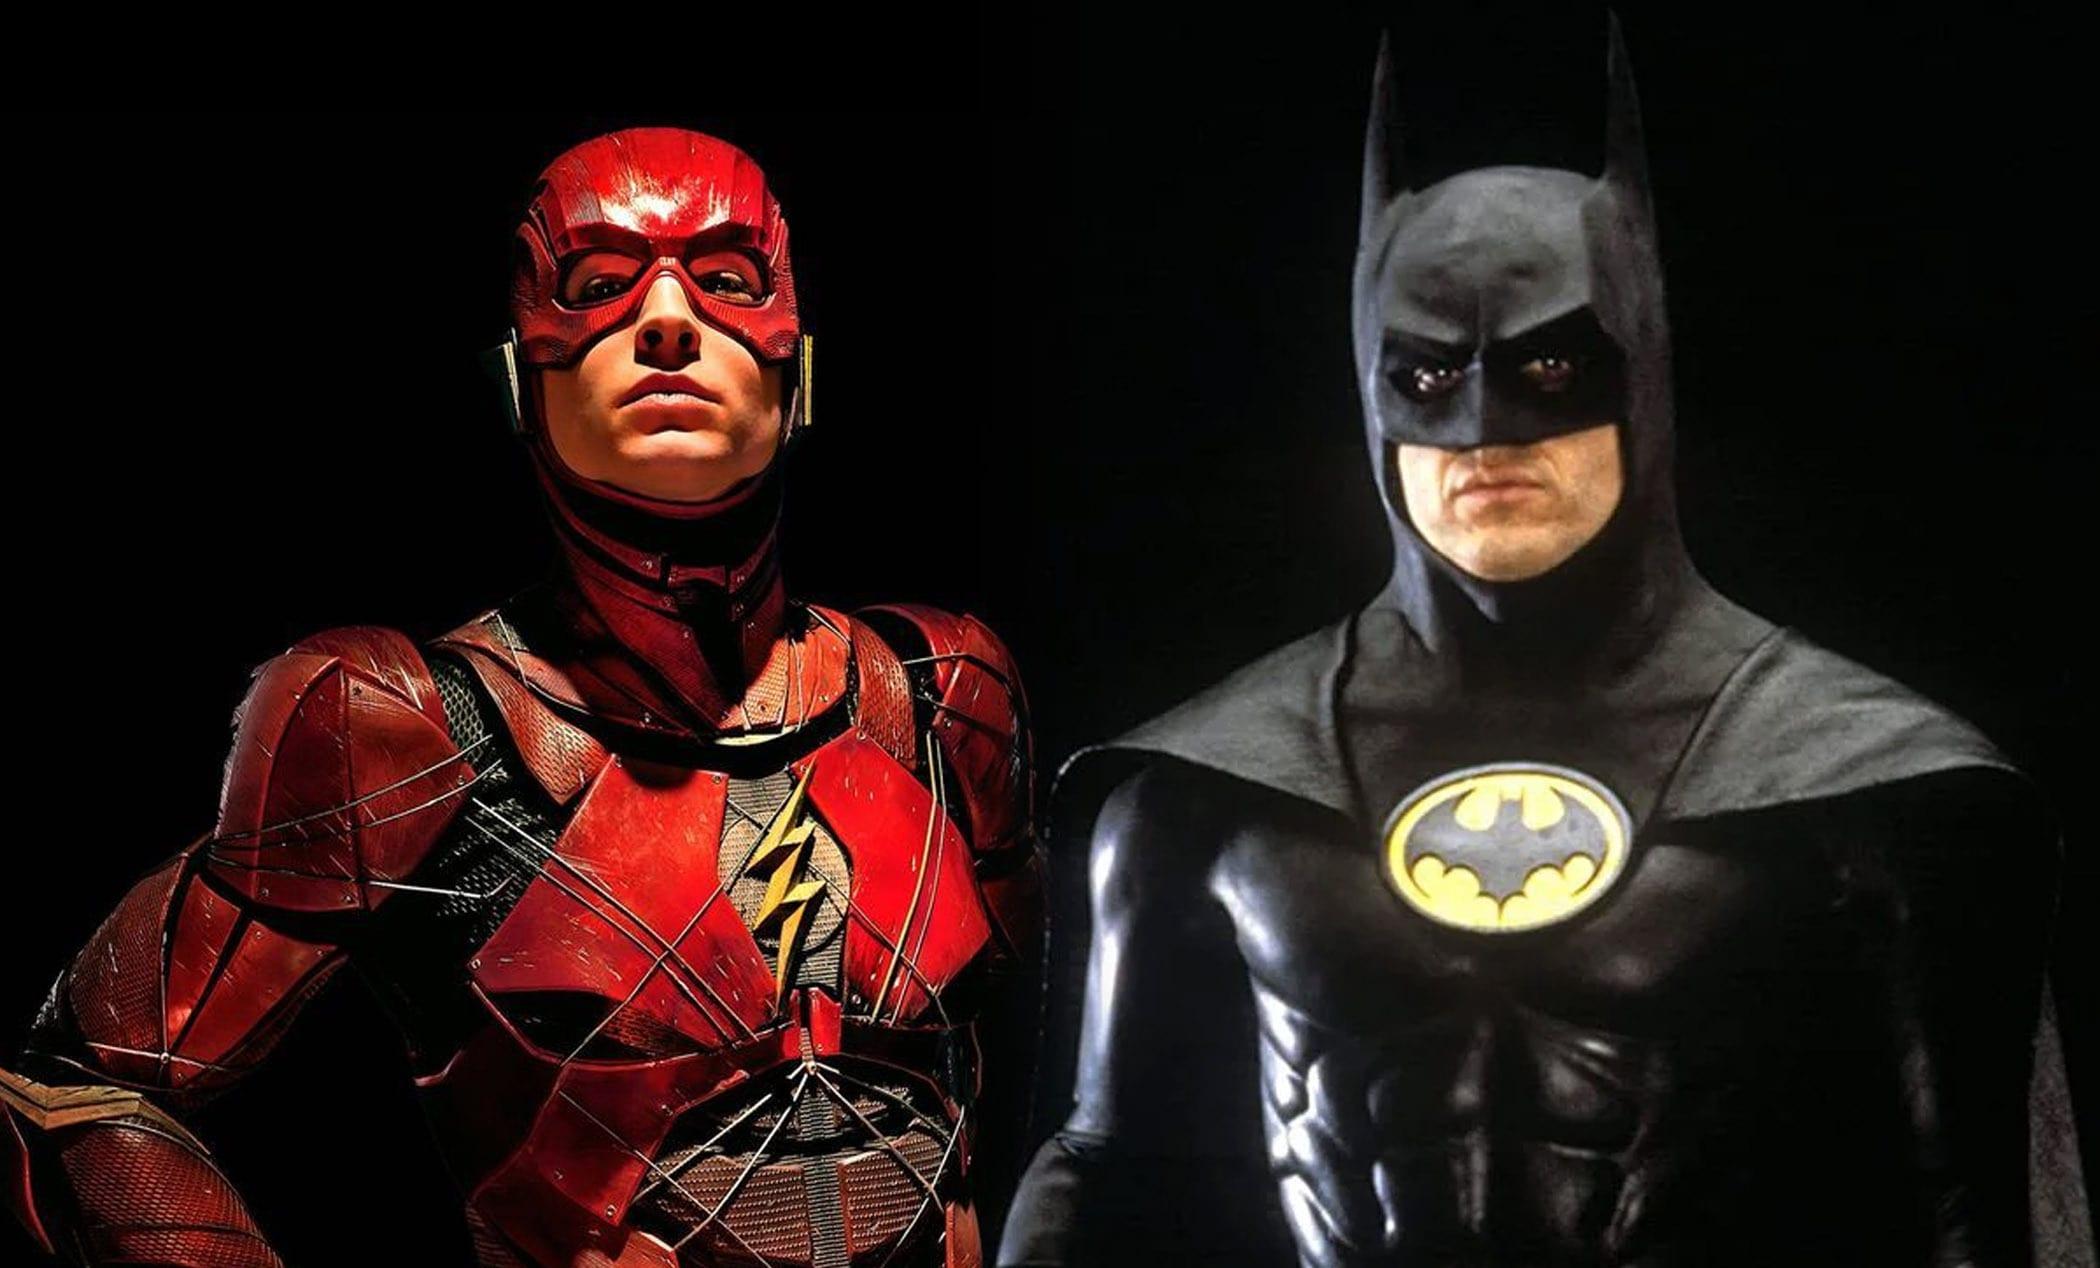 Michael-Keaton-Batman-Ezra-Millers-Flash